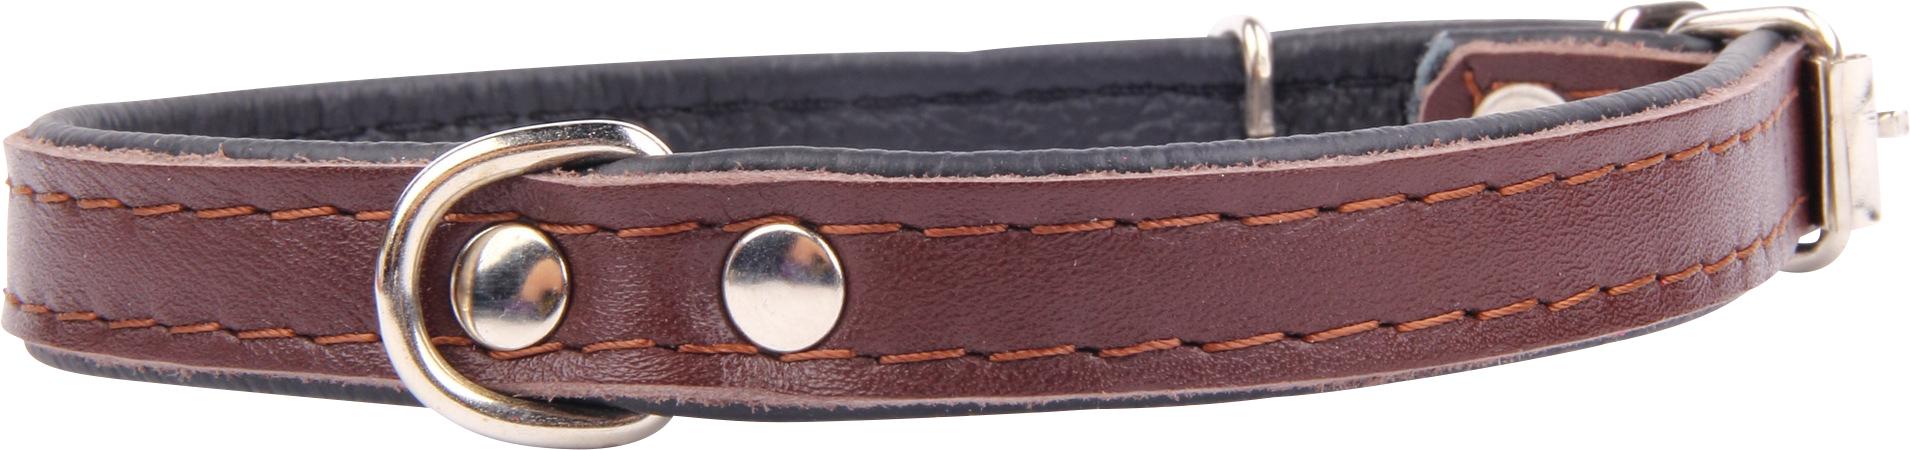 Läderhalsband, brun 55 cm